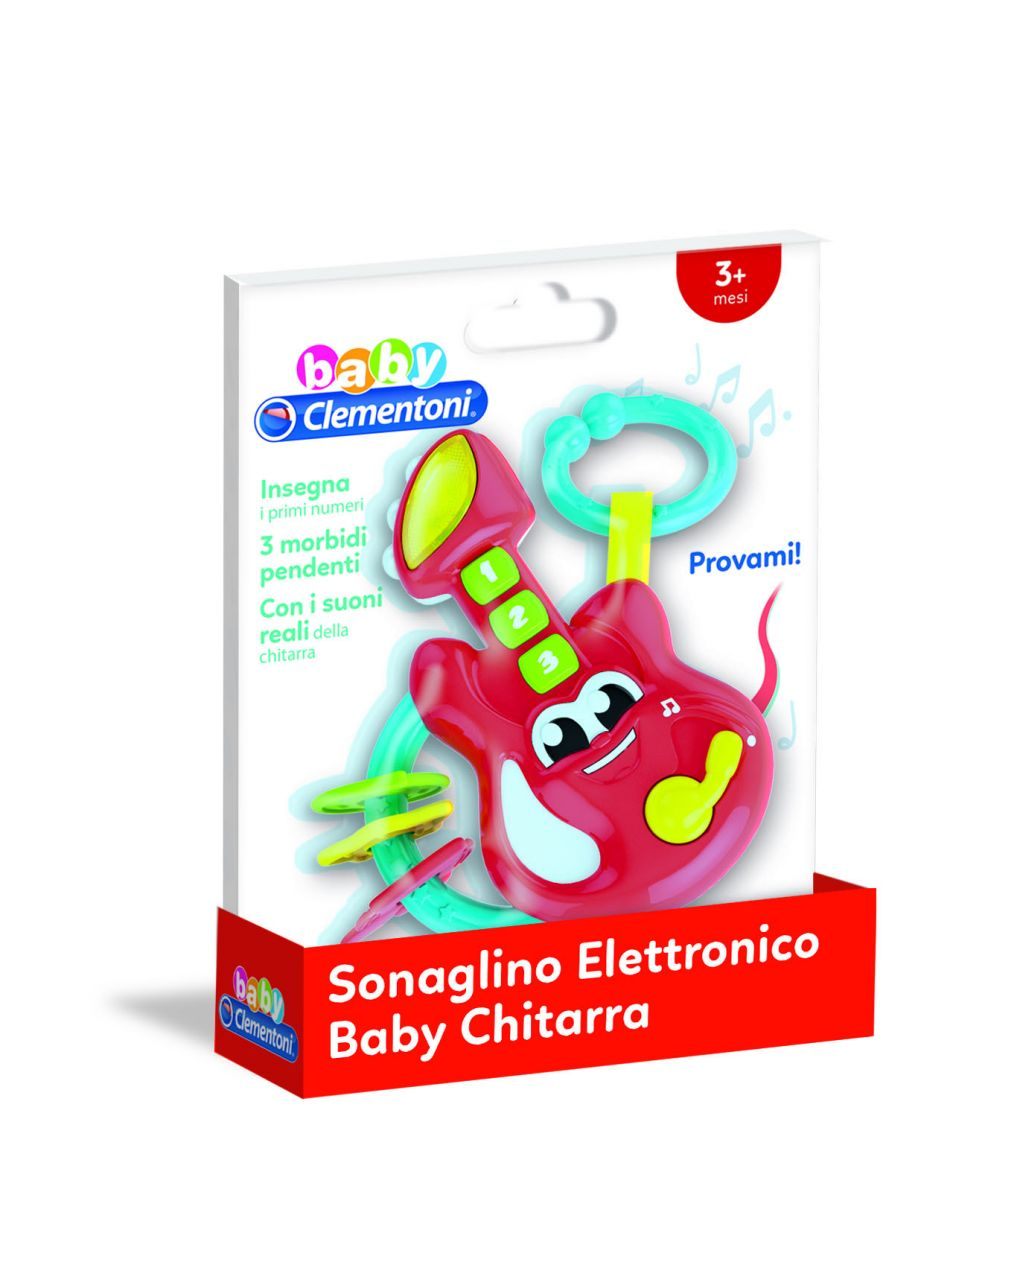 Baby clementoni - sonaglino elettronico baby chitarra - Clementoni